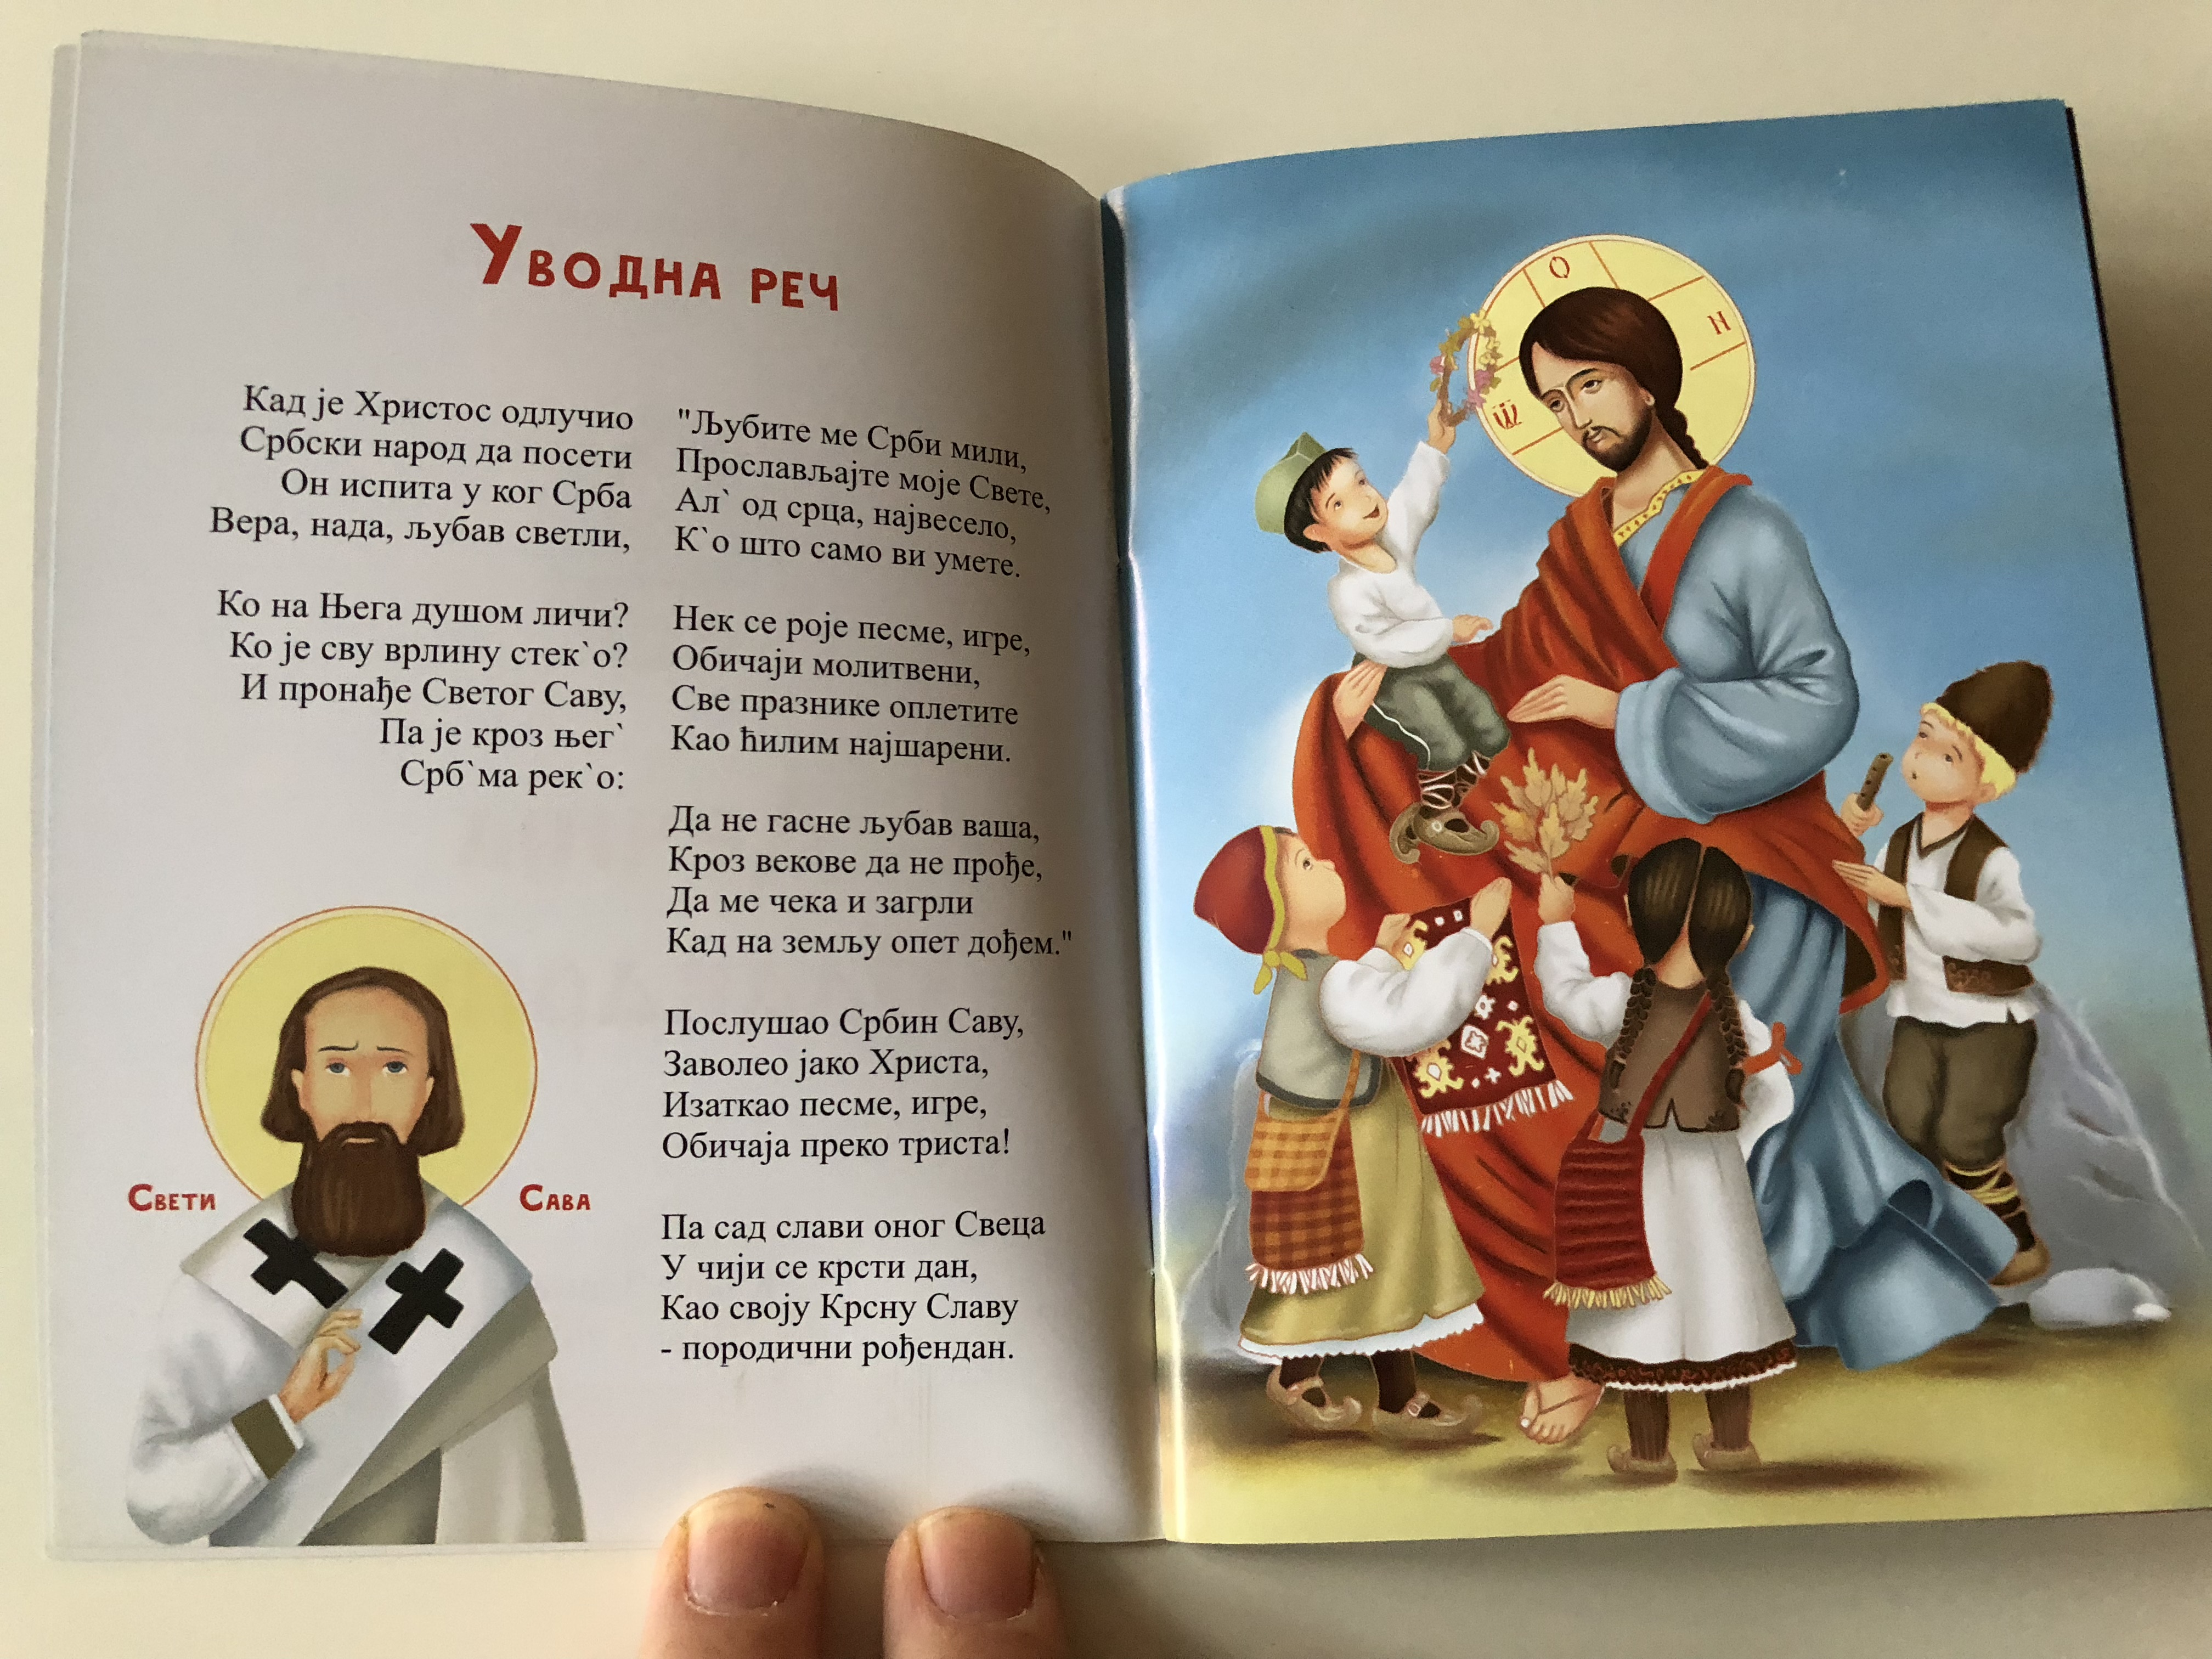 serbian-childrens-poems-orthodox-feasts-3-.jpg